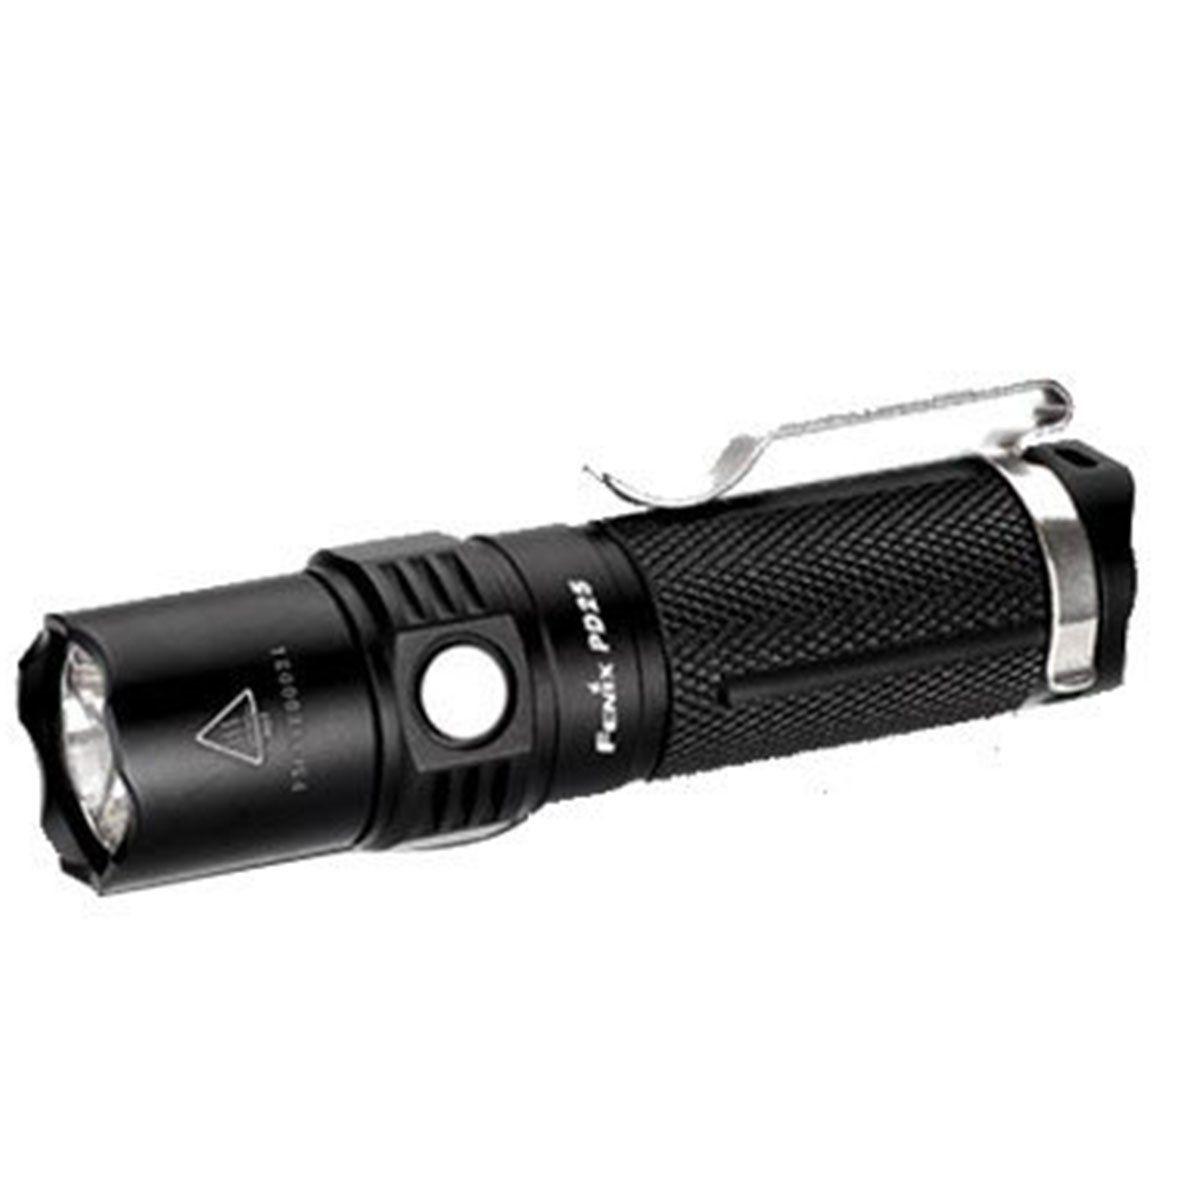 Lanterna Tatica Hilight P20 500 Lumens